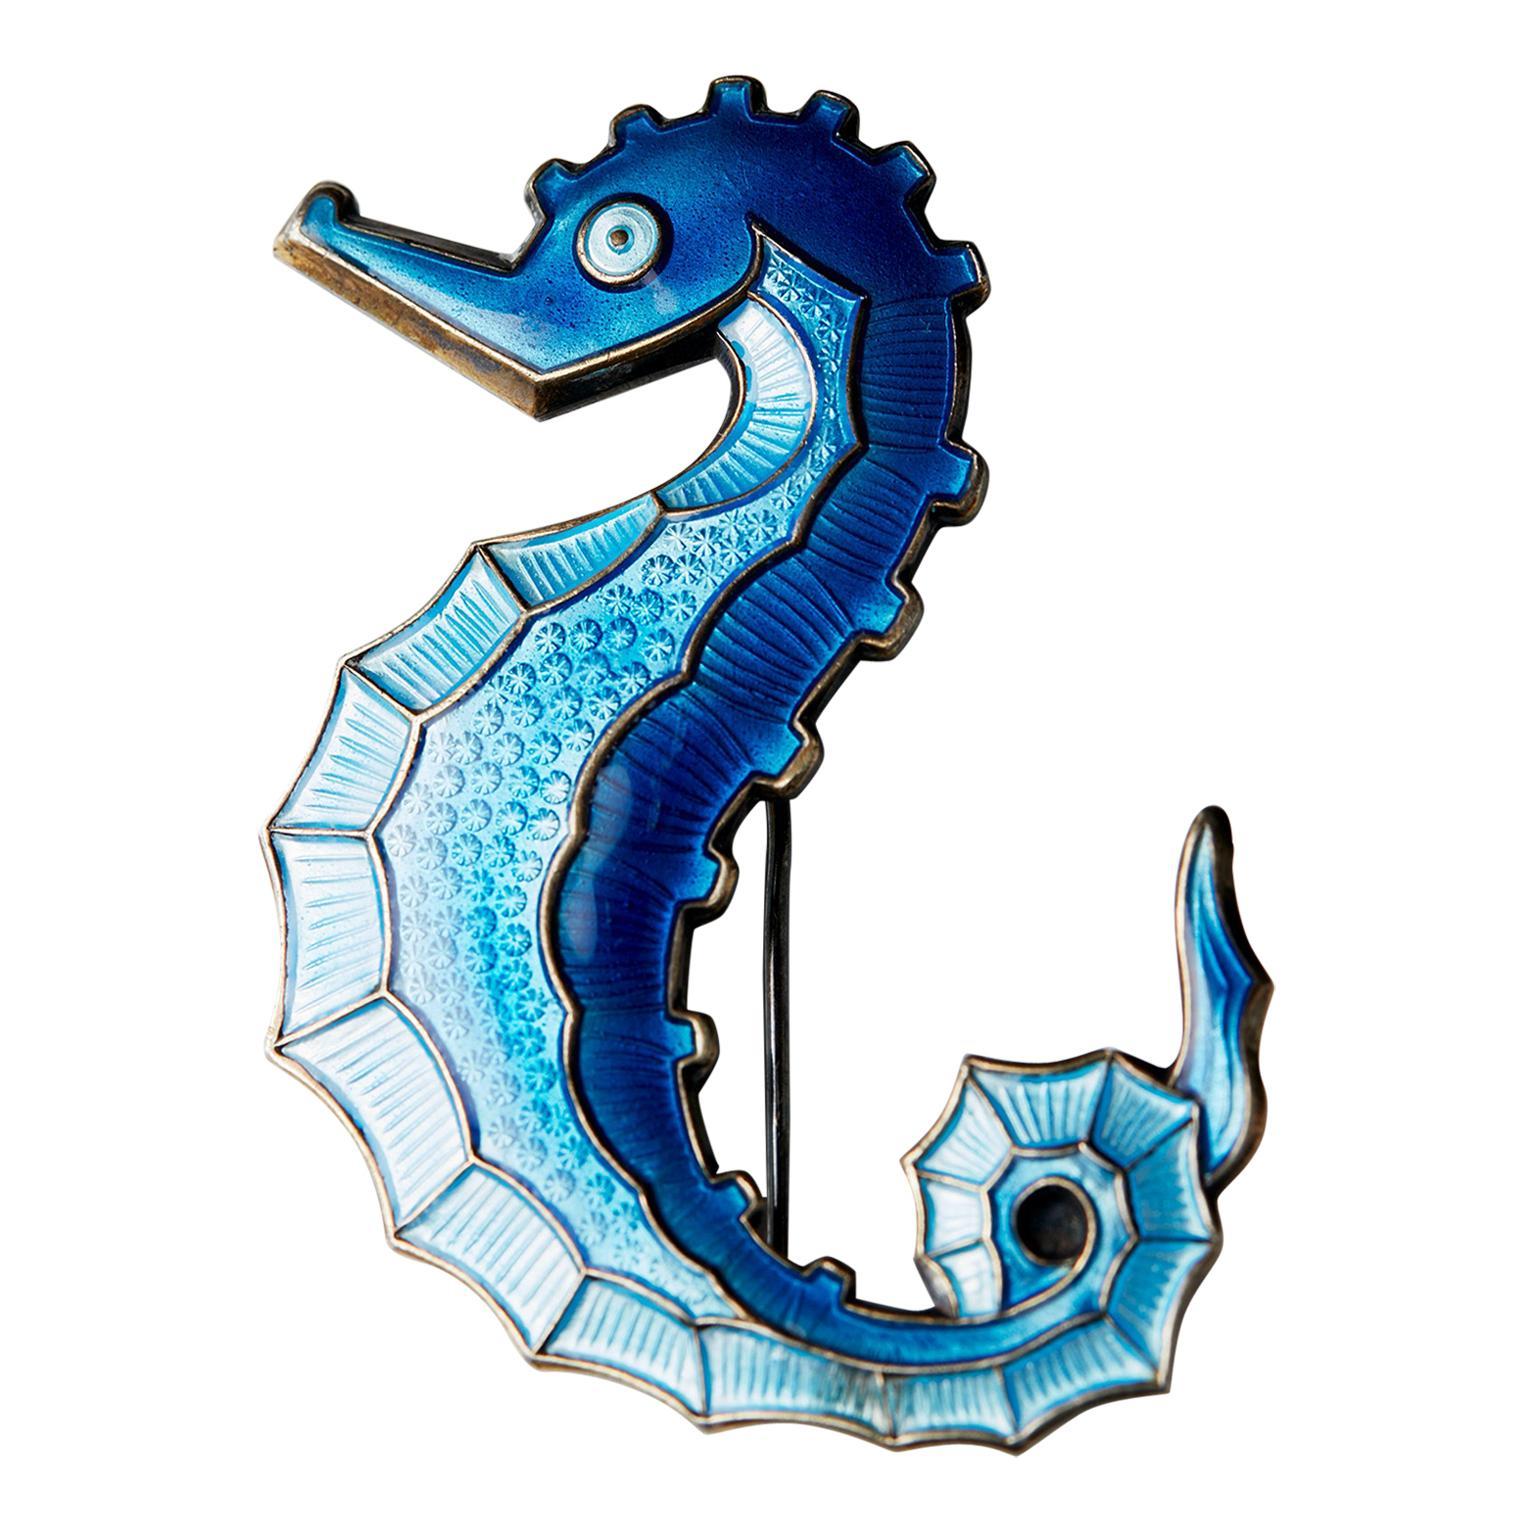 Seahorse Pin Designed by David-Andersen, Norway, 1960s